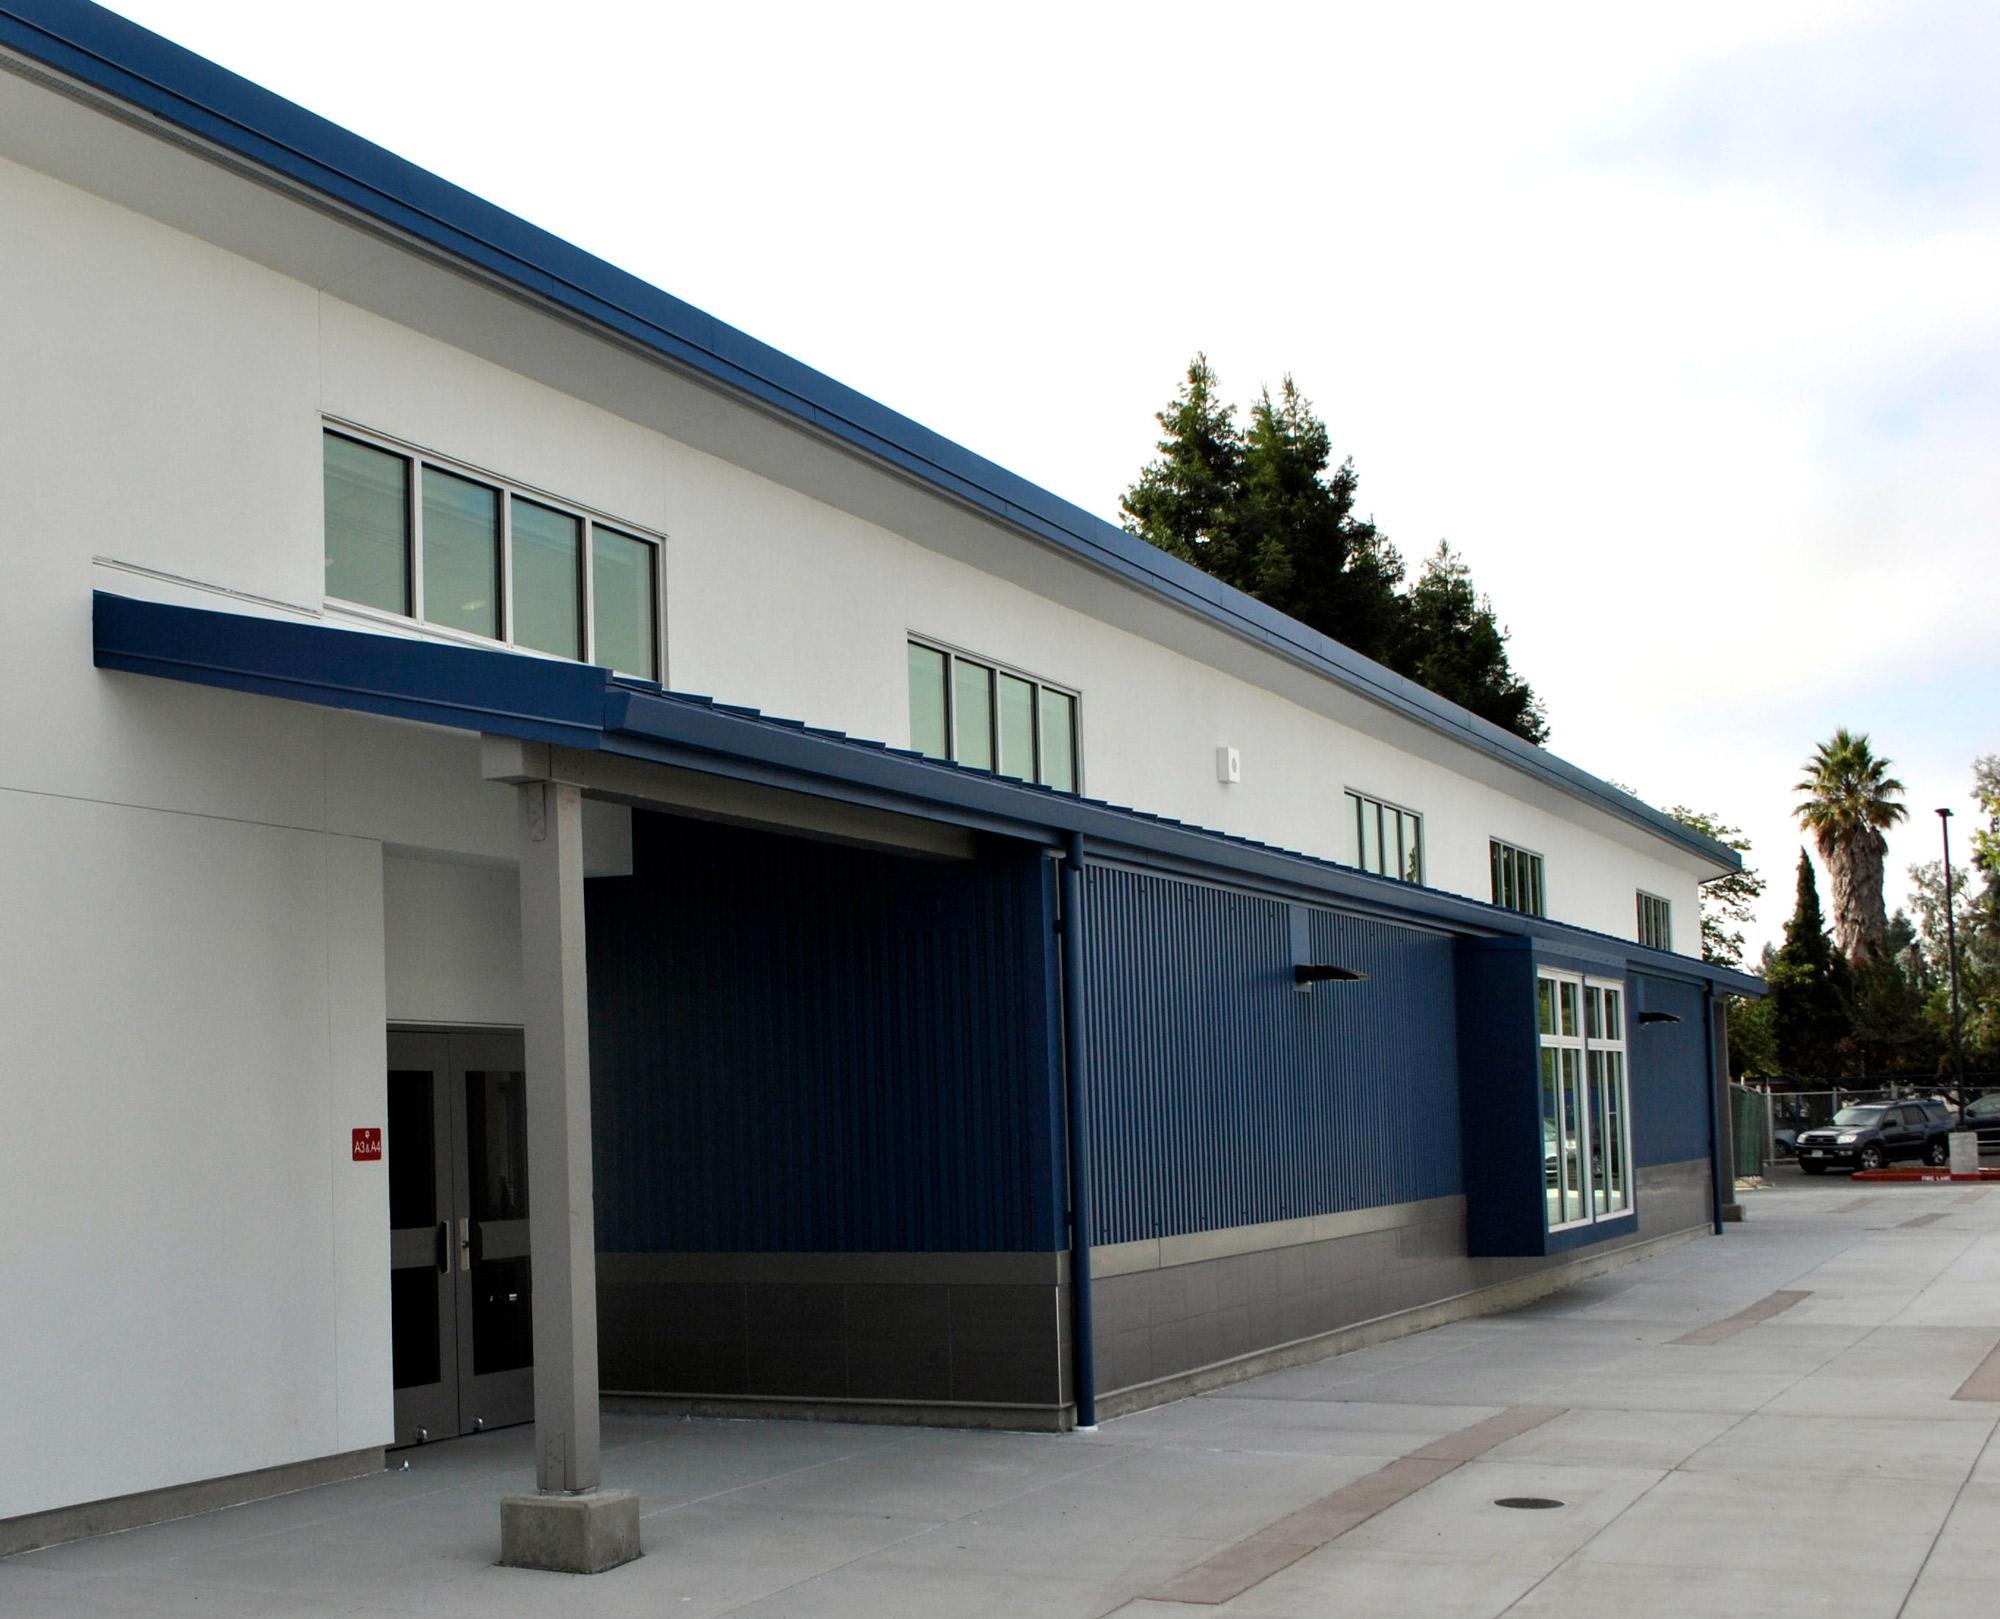 New Modular Kindergarten Building Replaces Portable Classrooms